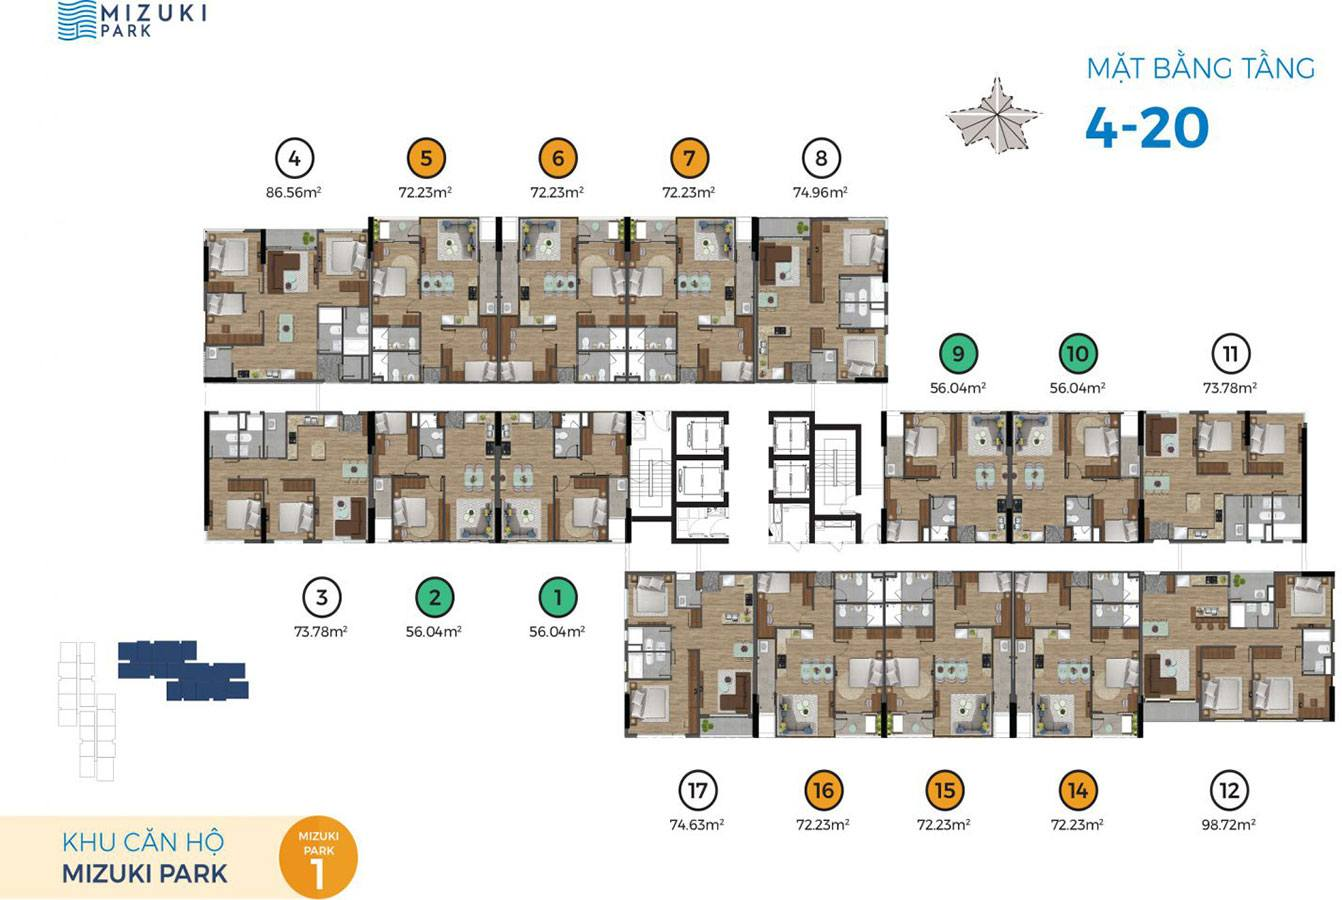 Mặt bằng block Mizuki Park 1 tầng 4 đến tầng 20.